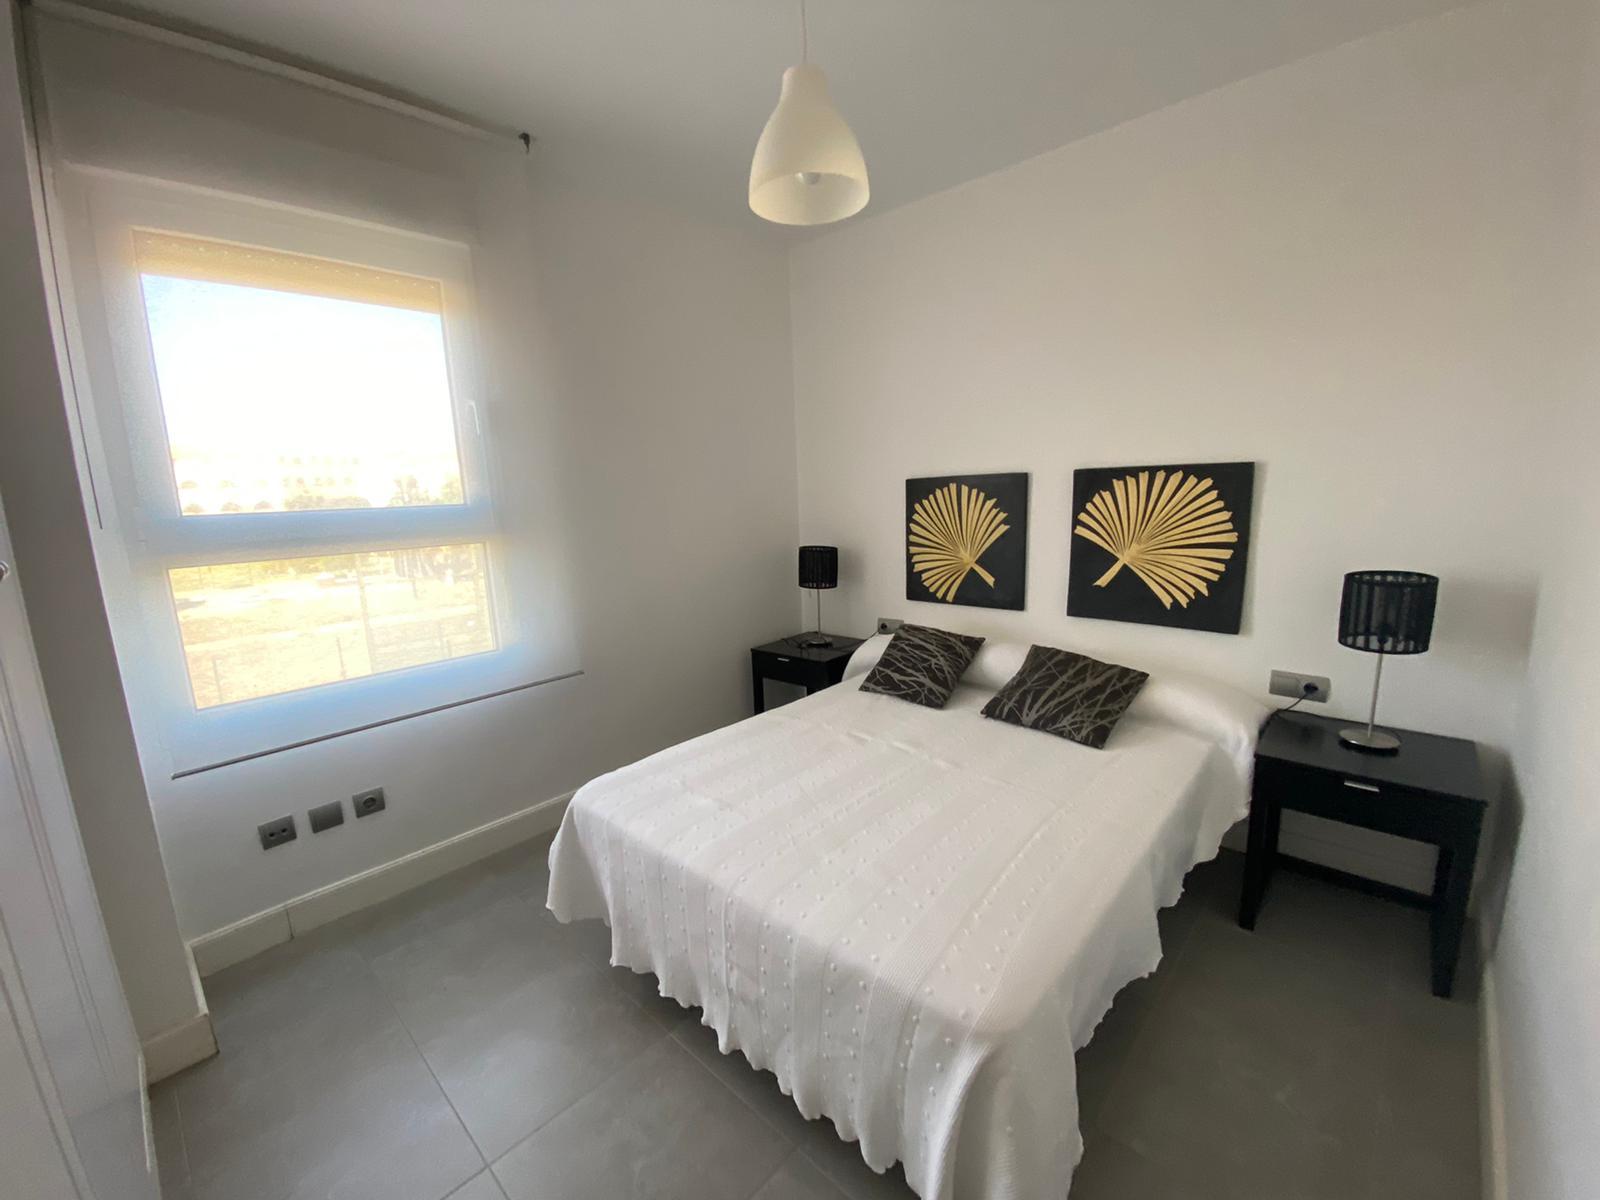 Imagen 3 del Apartamento en El Espigón, 1ª Planta nº4 Poniente (3d+2b), Punta del Moral (HUELVA), Paseo de la Cruz nº22